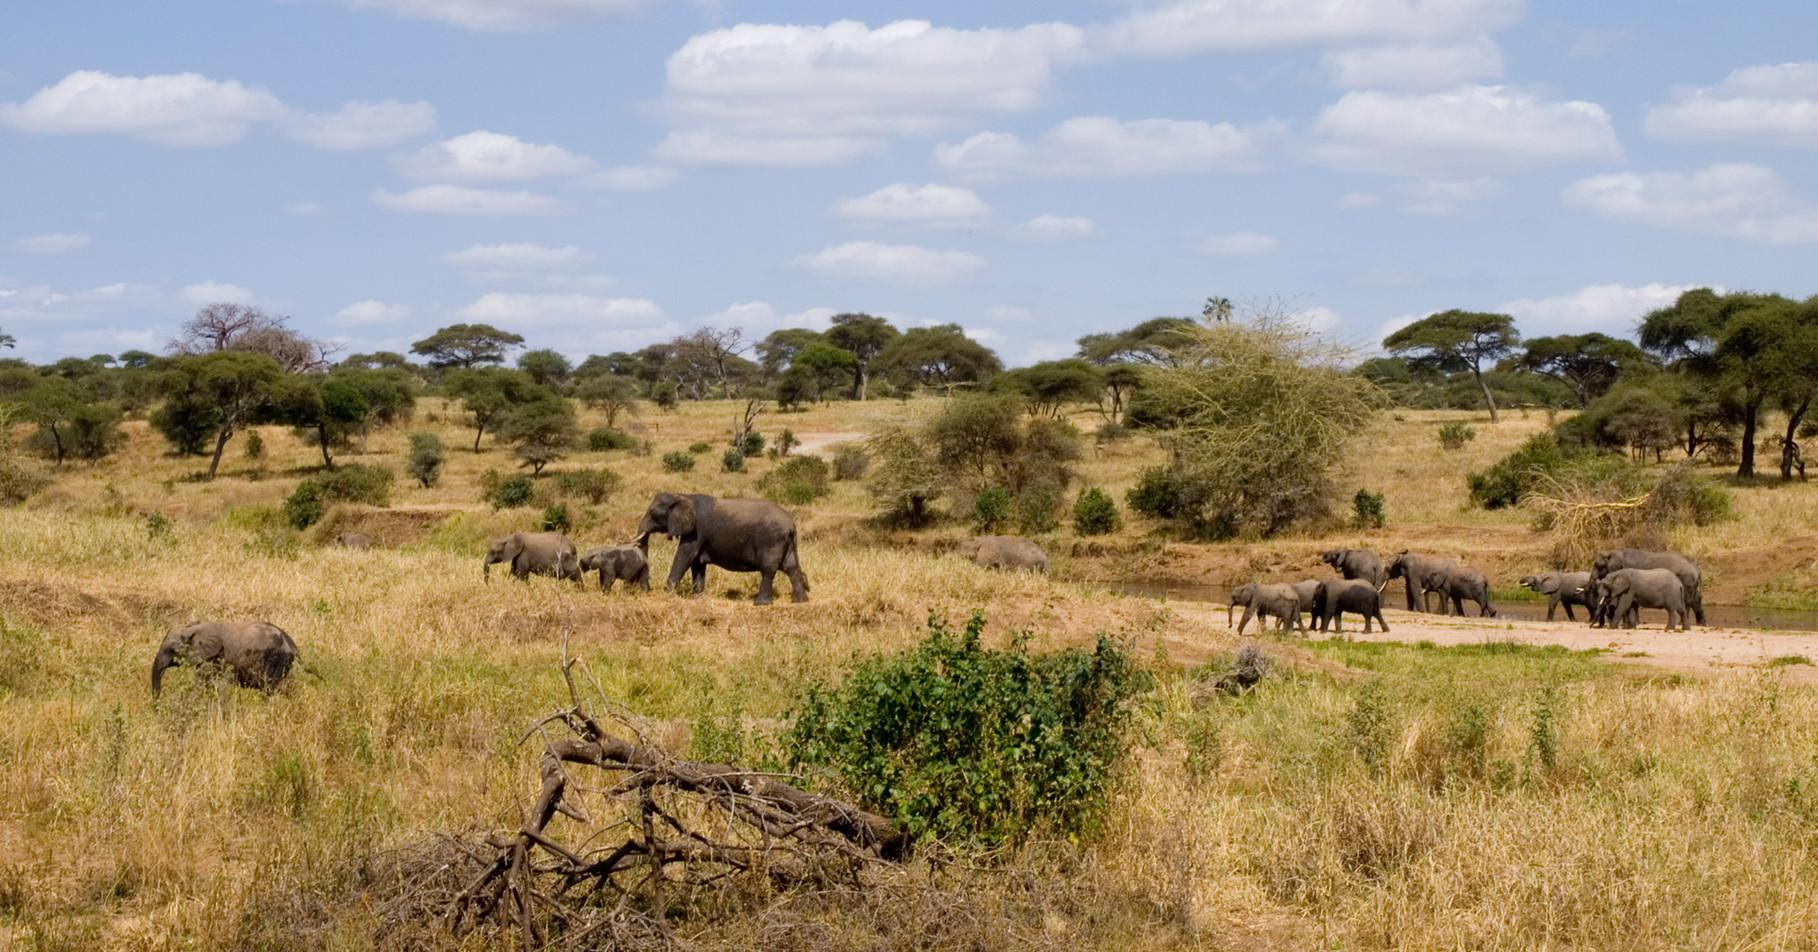 Elefants [Serengeti, Tanzania, 2012]